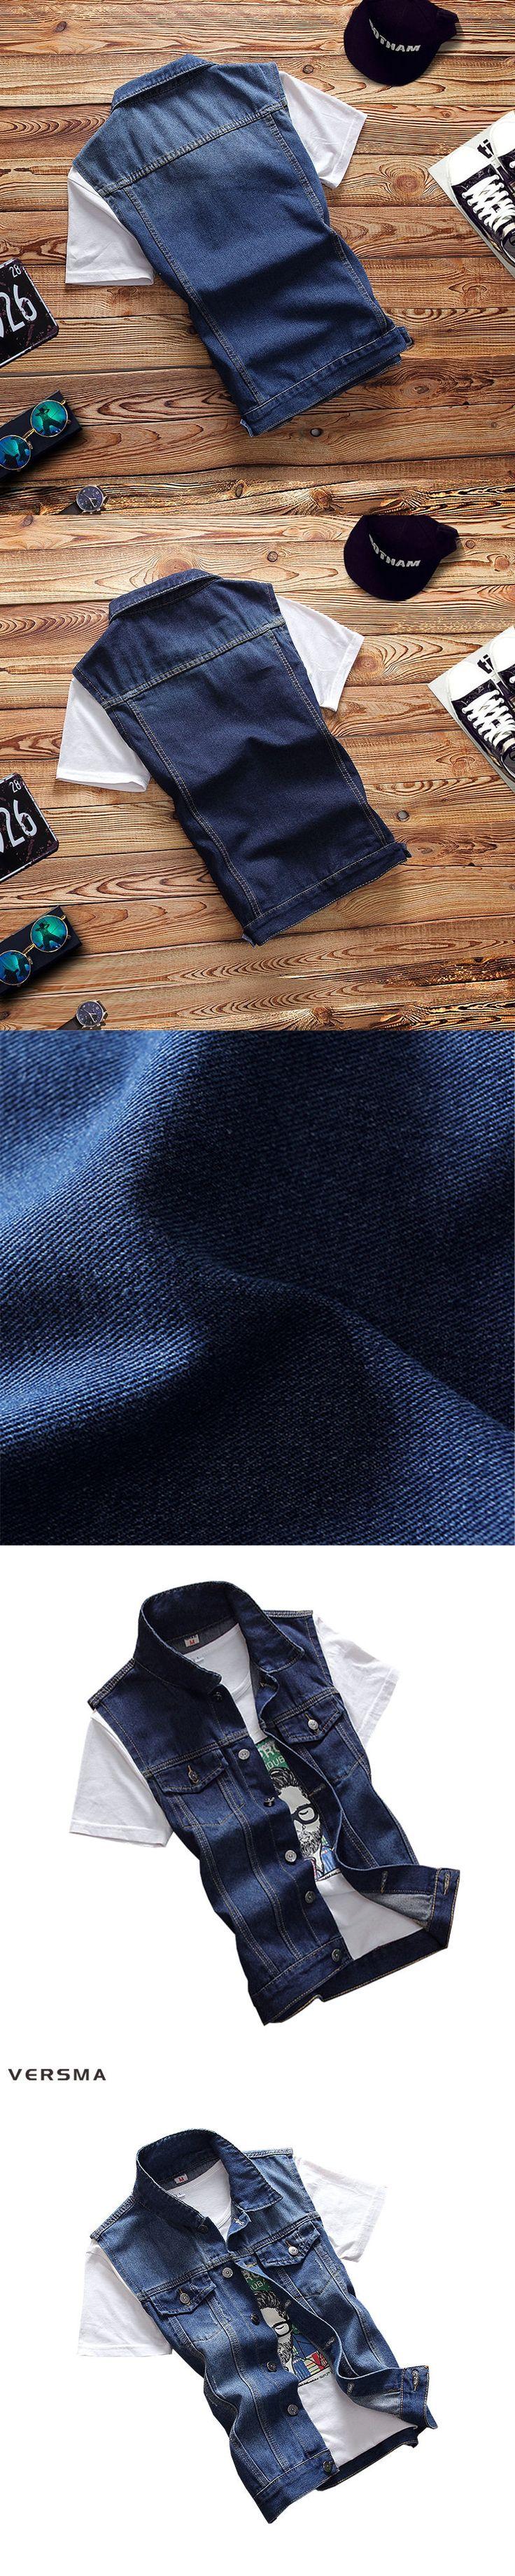 VERSMA Blue Jeans Vest Mens Waistcoats Vests of Men Denim Sleeveless Jacket Men Vest Denim Motorcycle Vest Men Jacket Coat XXXL